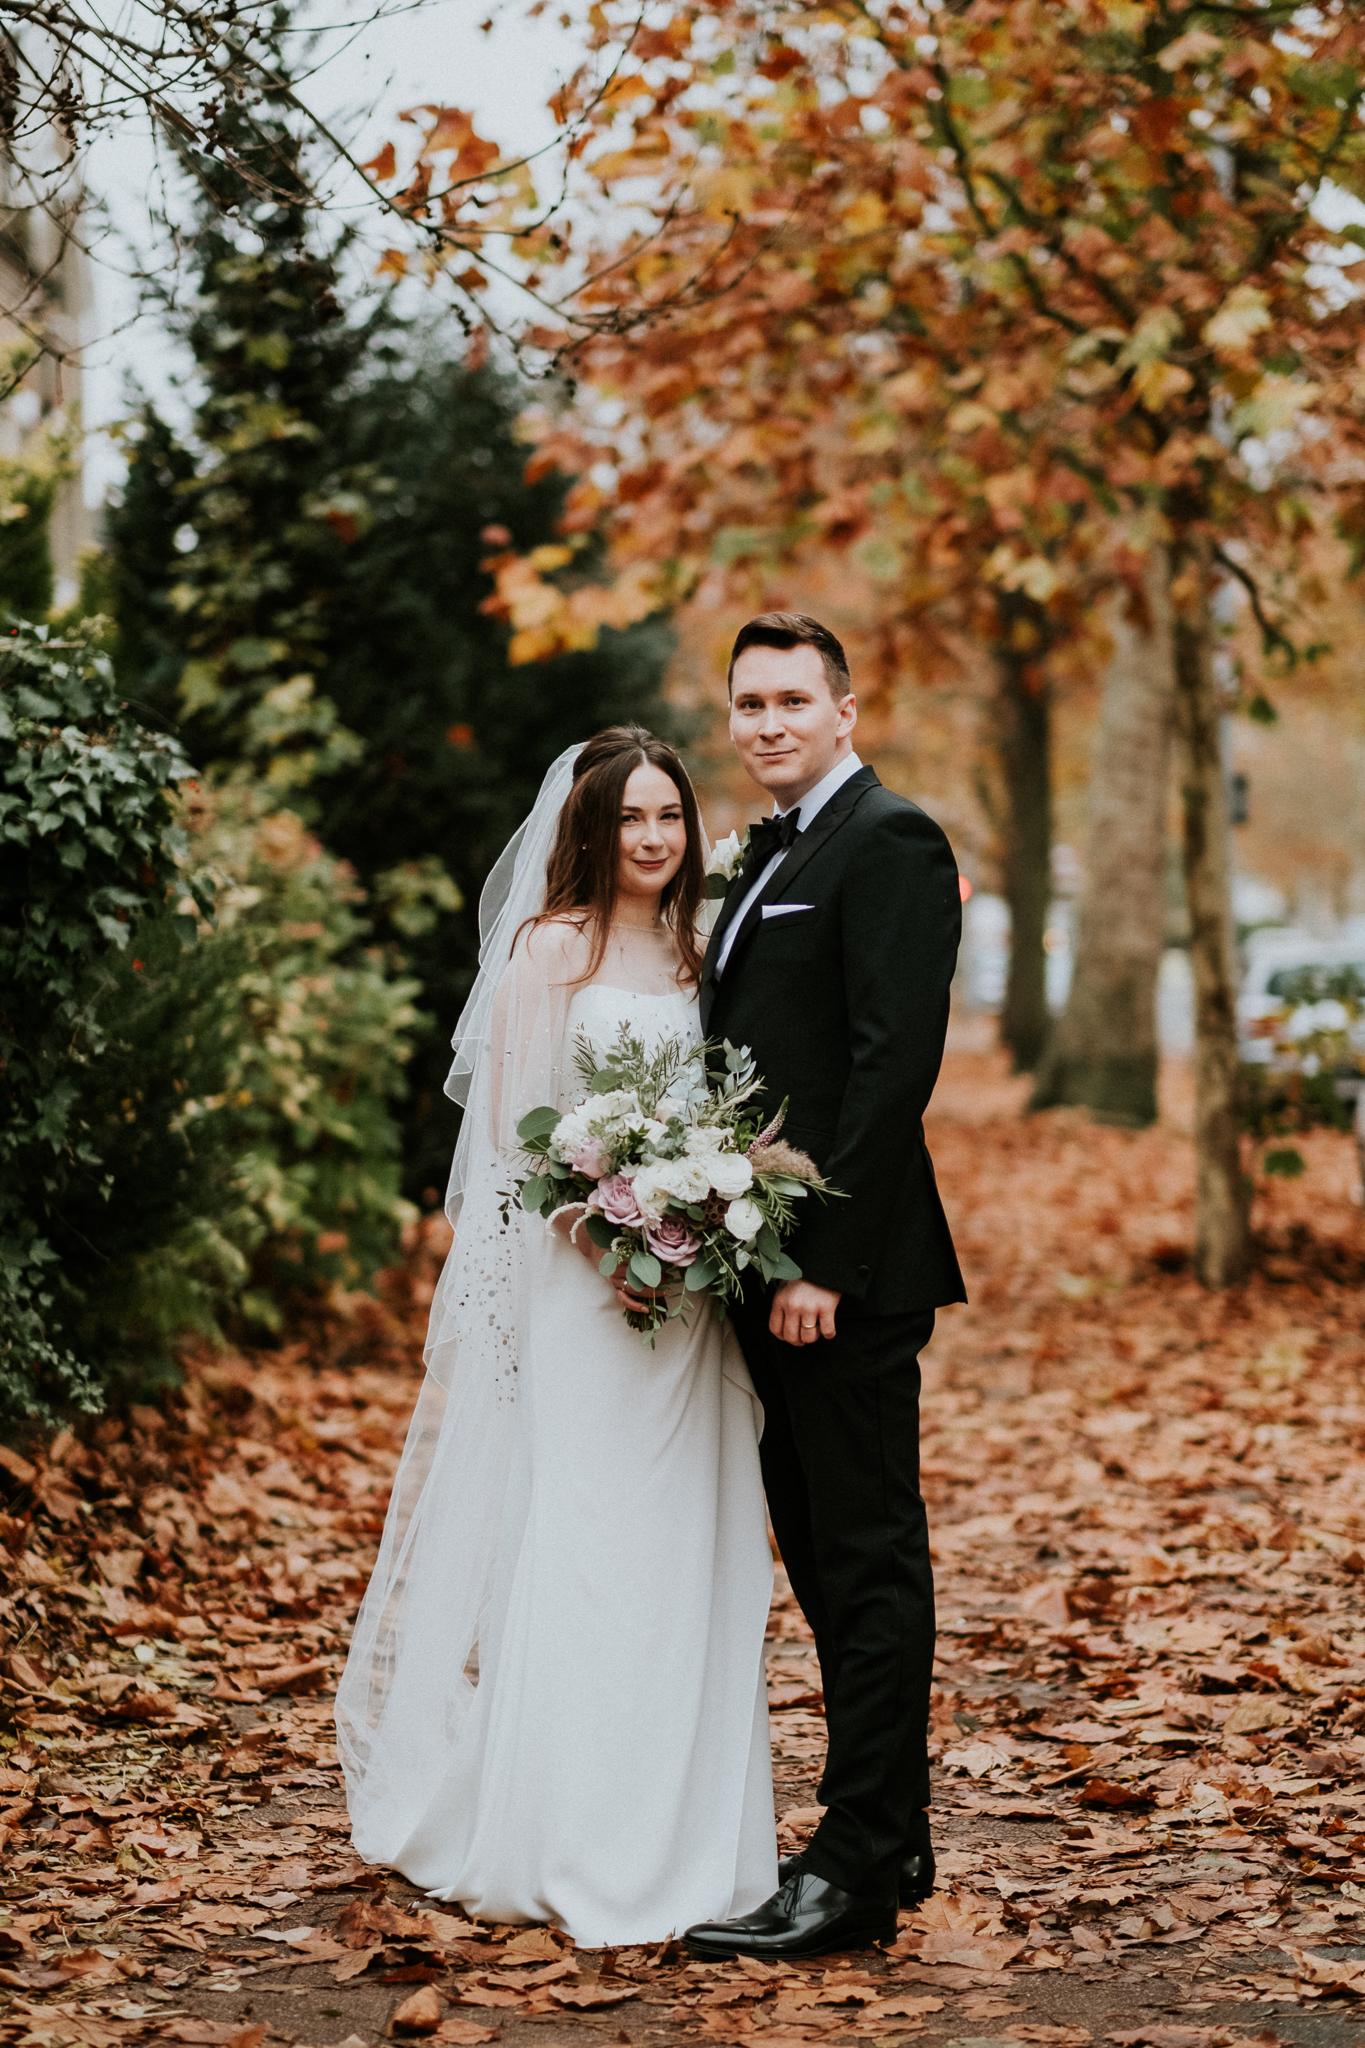 27 London winter wedding artistic joanna nicole photography1.jpg